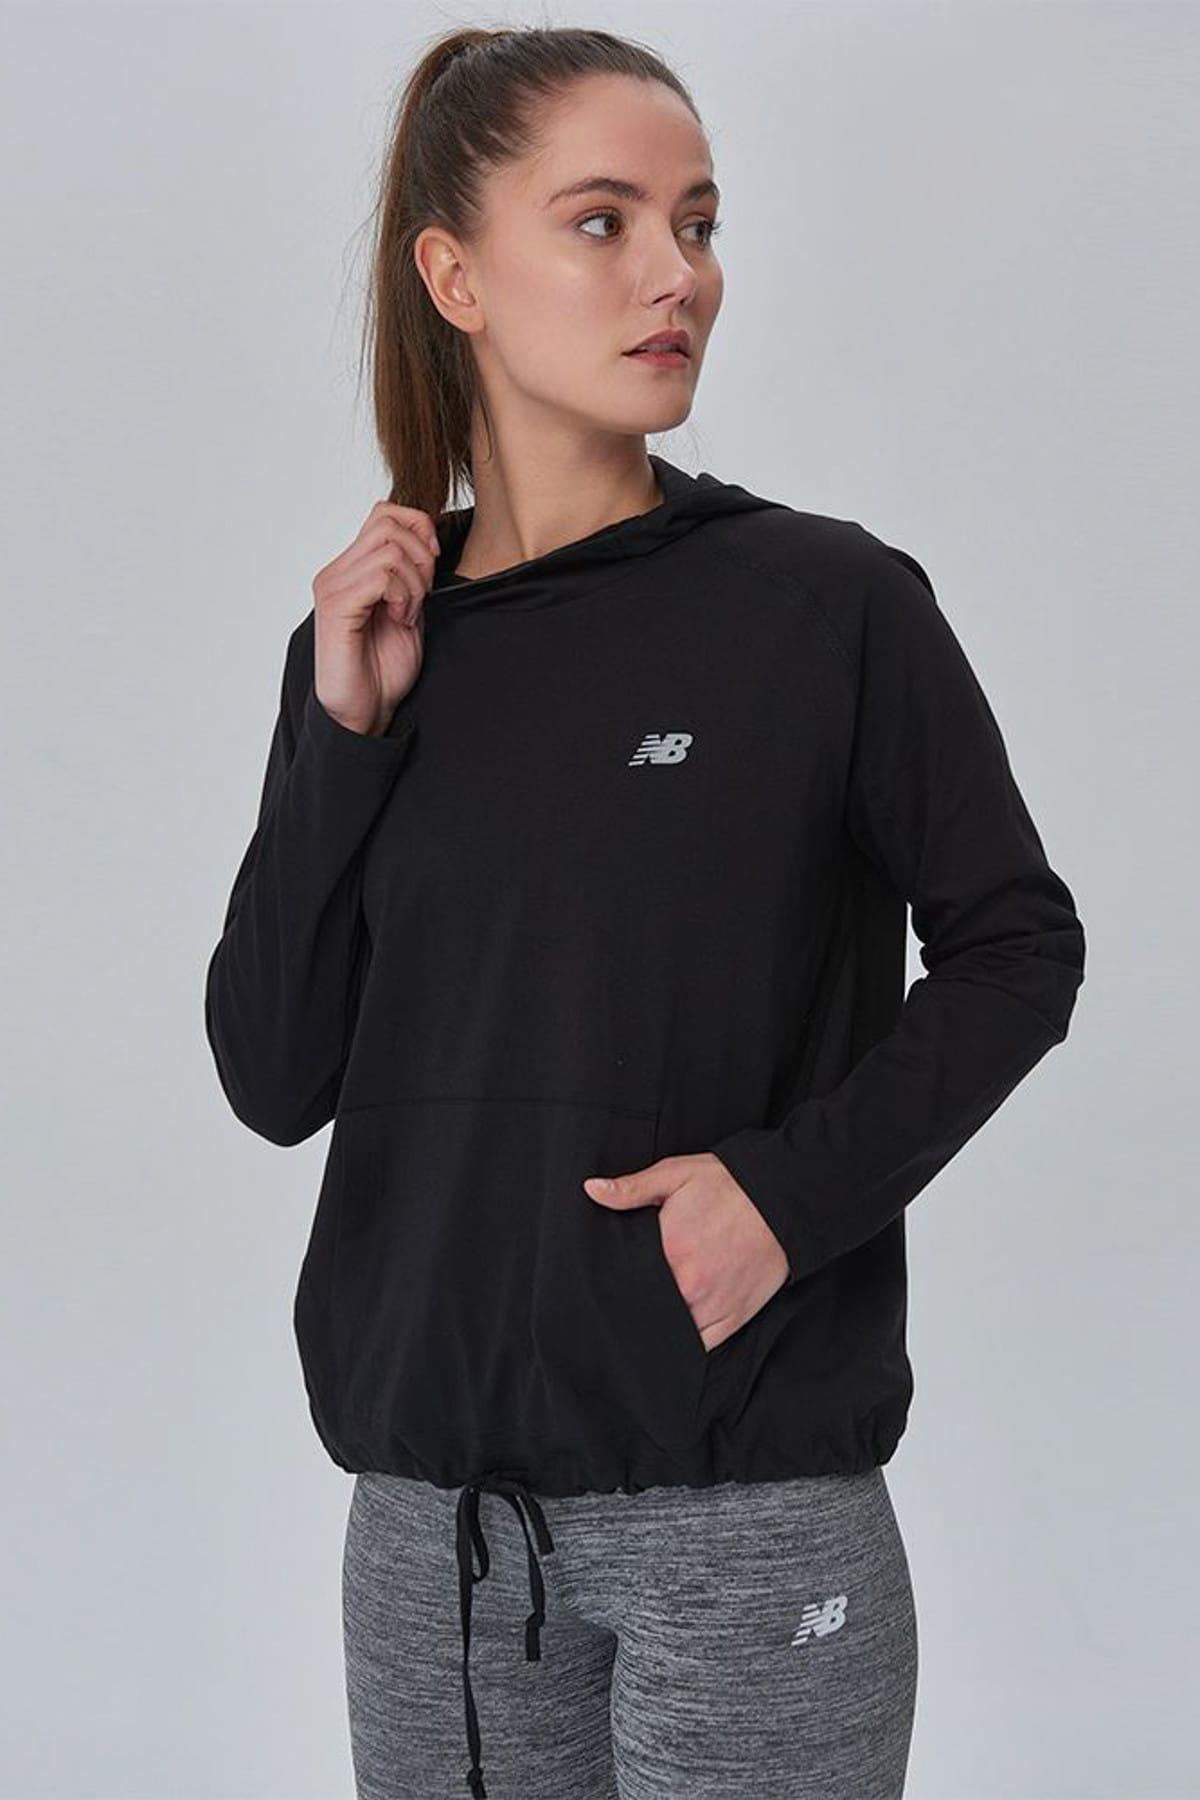 Sweatshirt - WTH1961 - WTH1961-BK